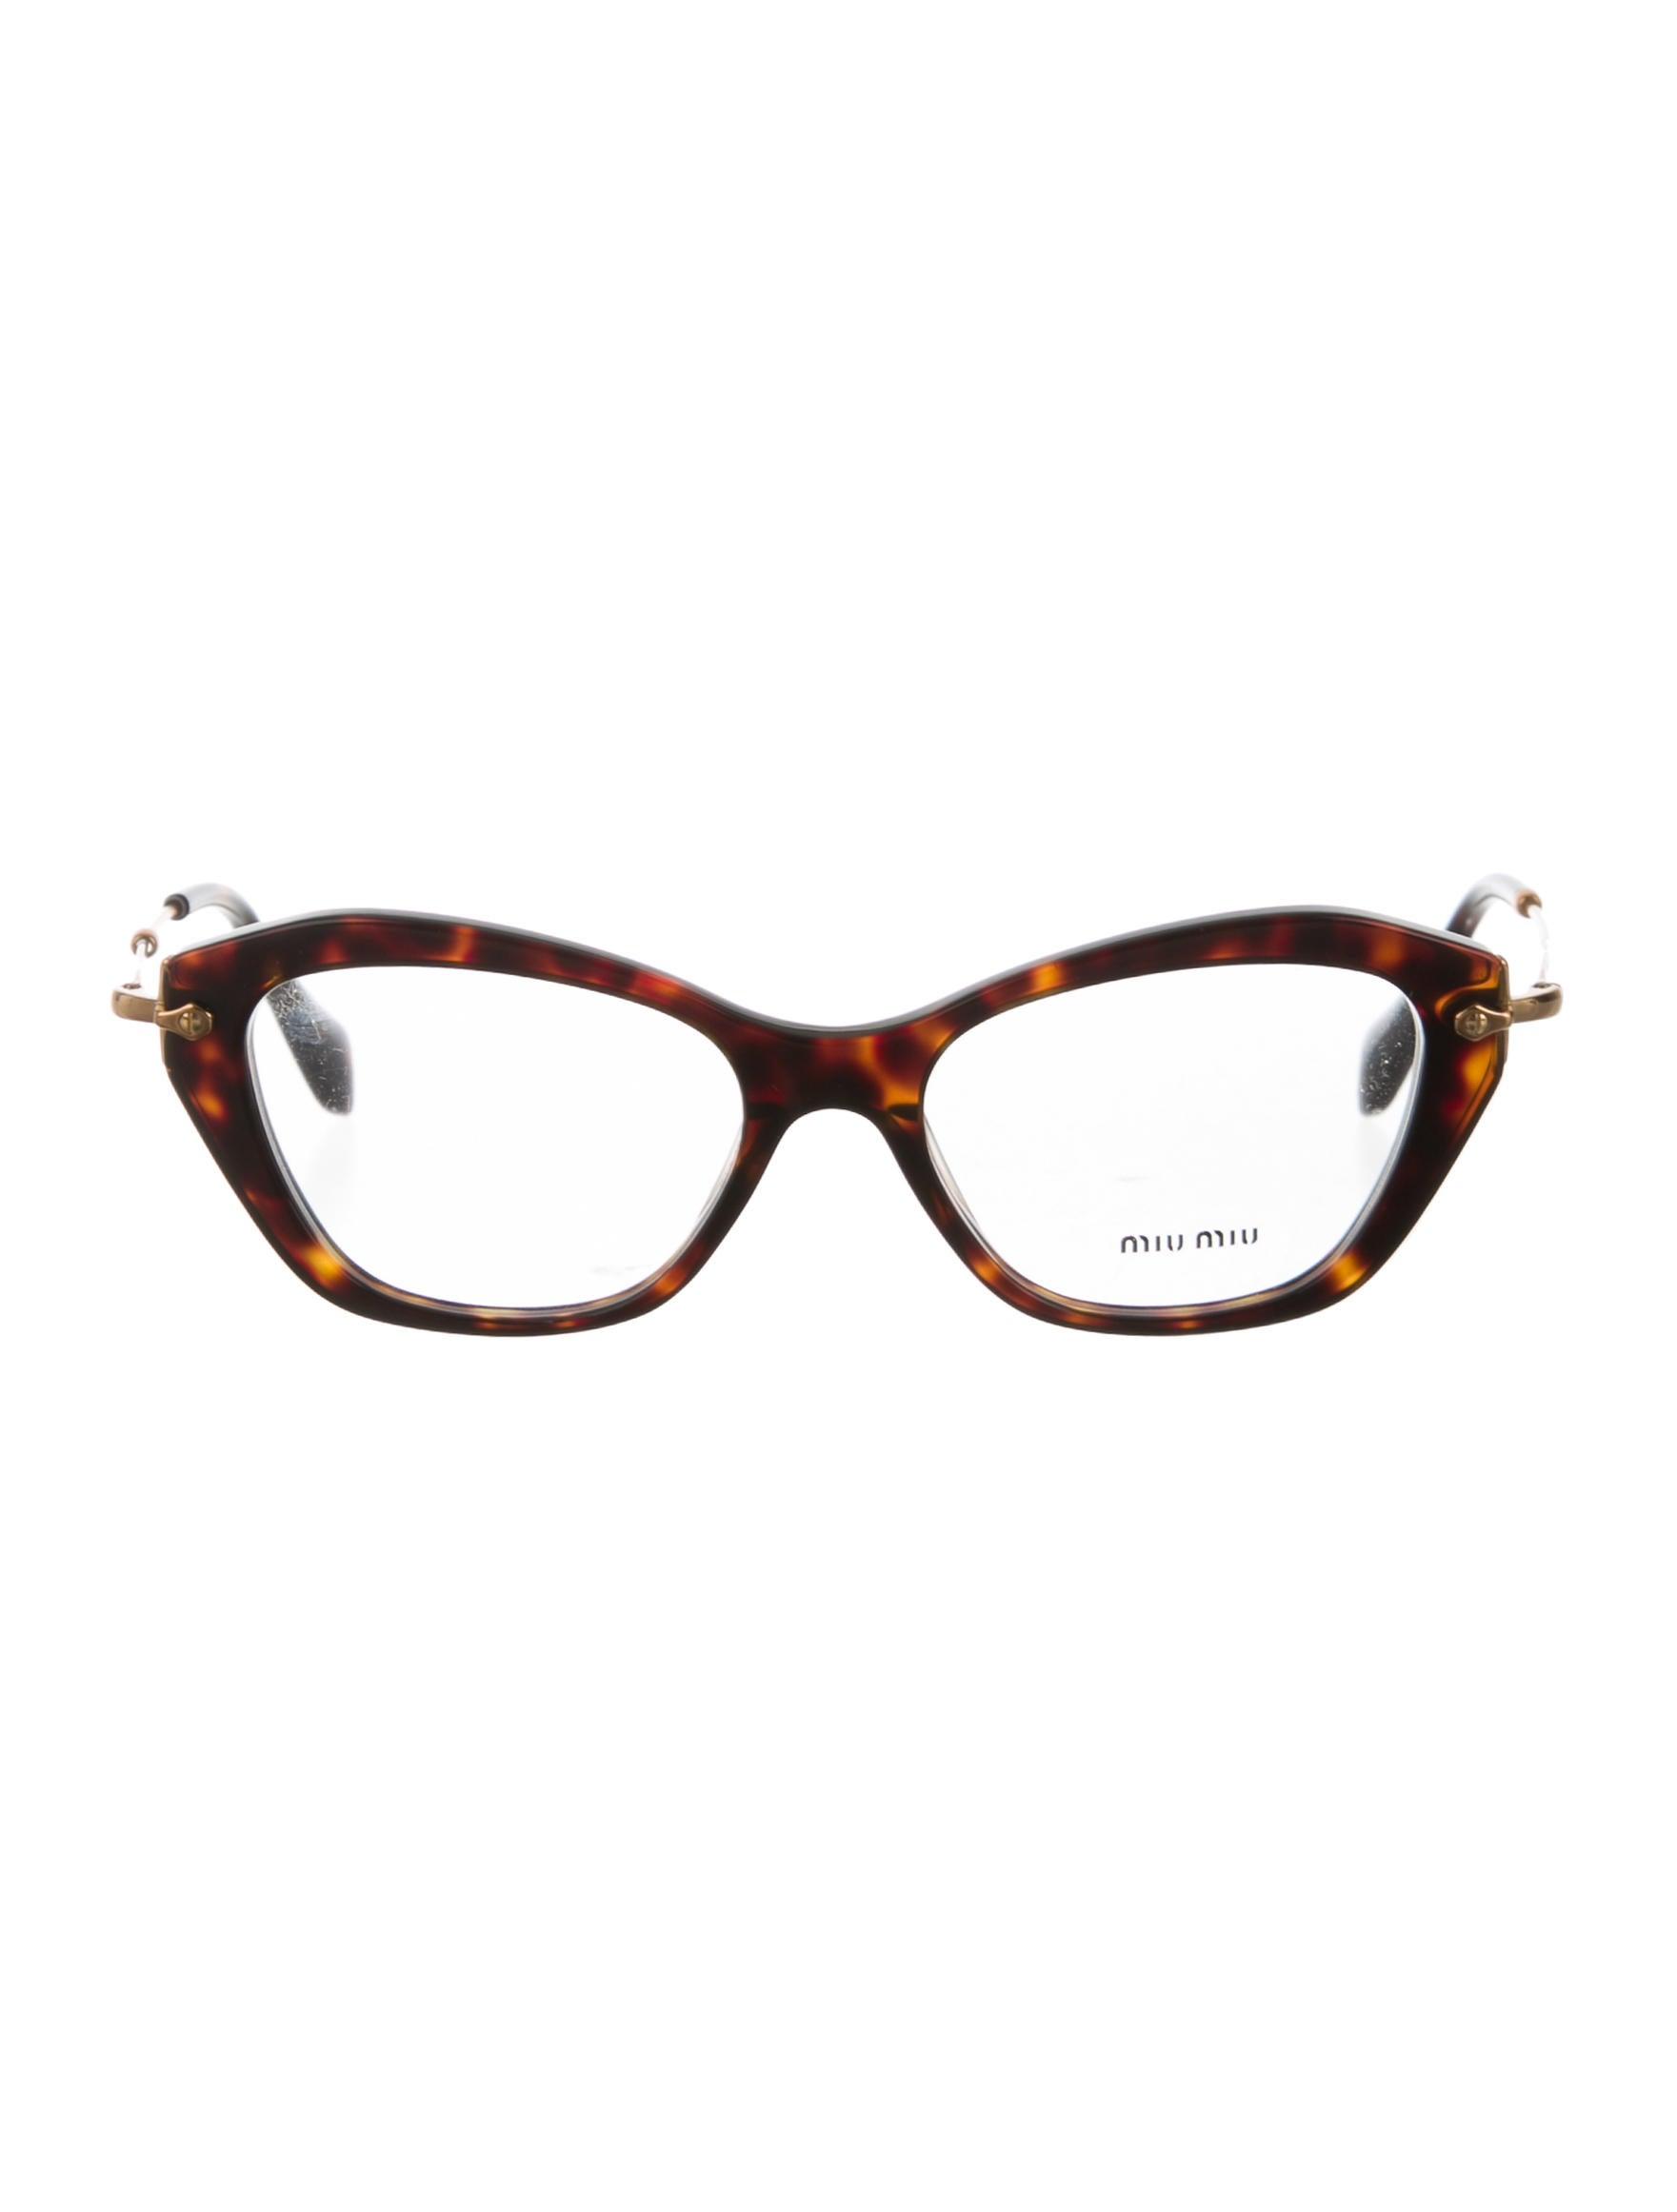 miu miu tortoiseshell cat eye eyeglasses accessories